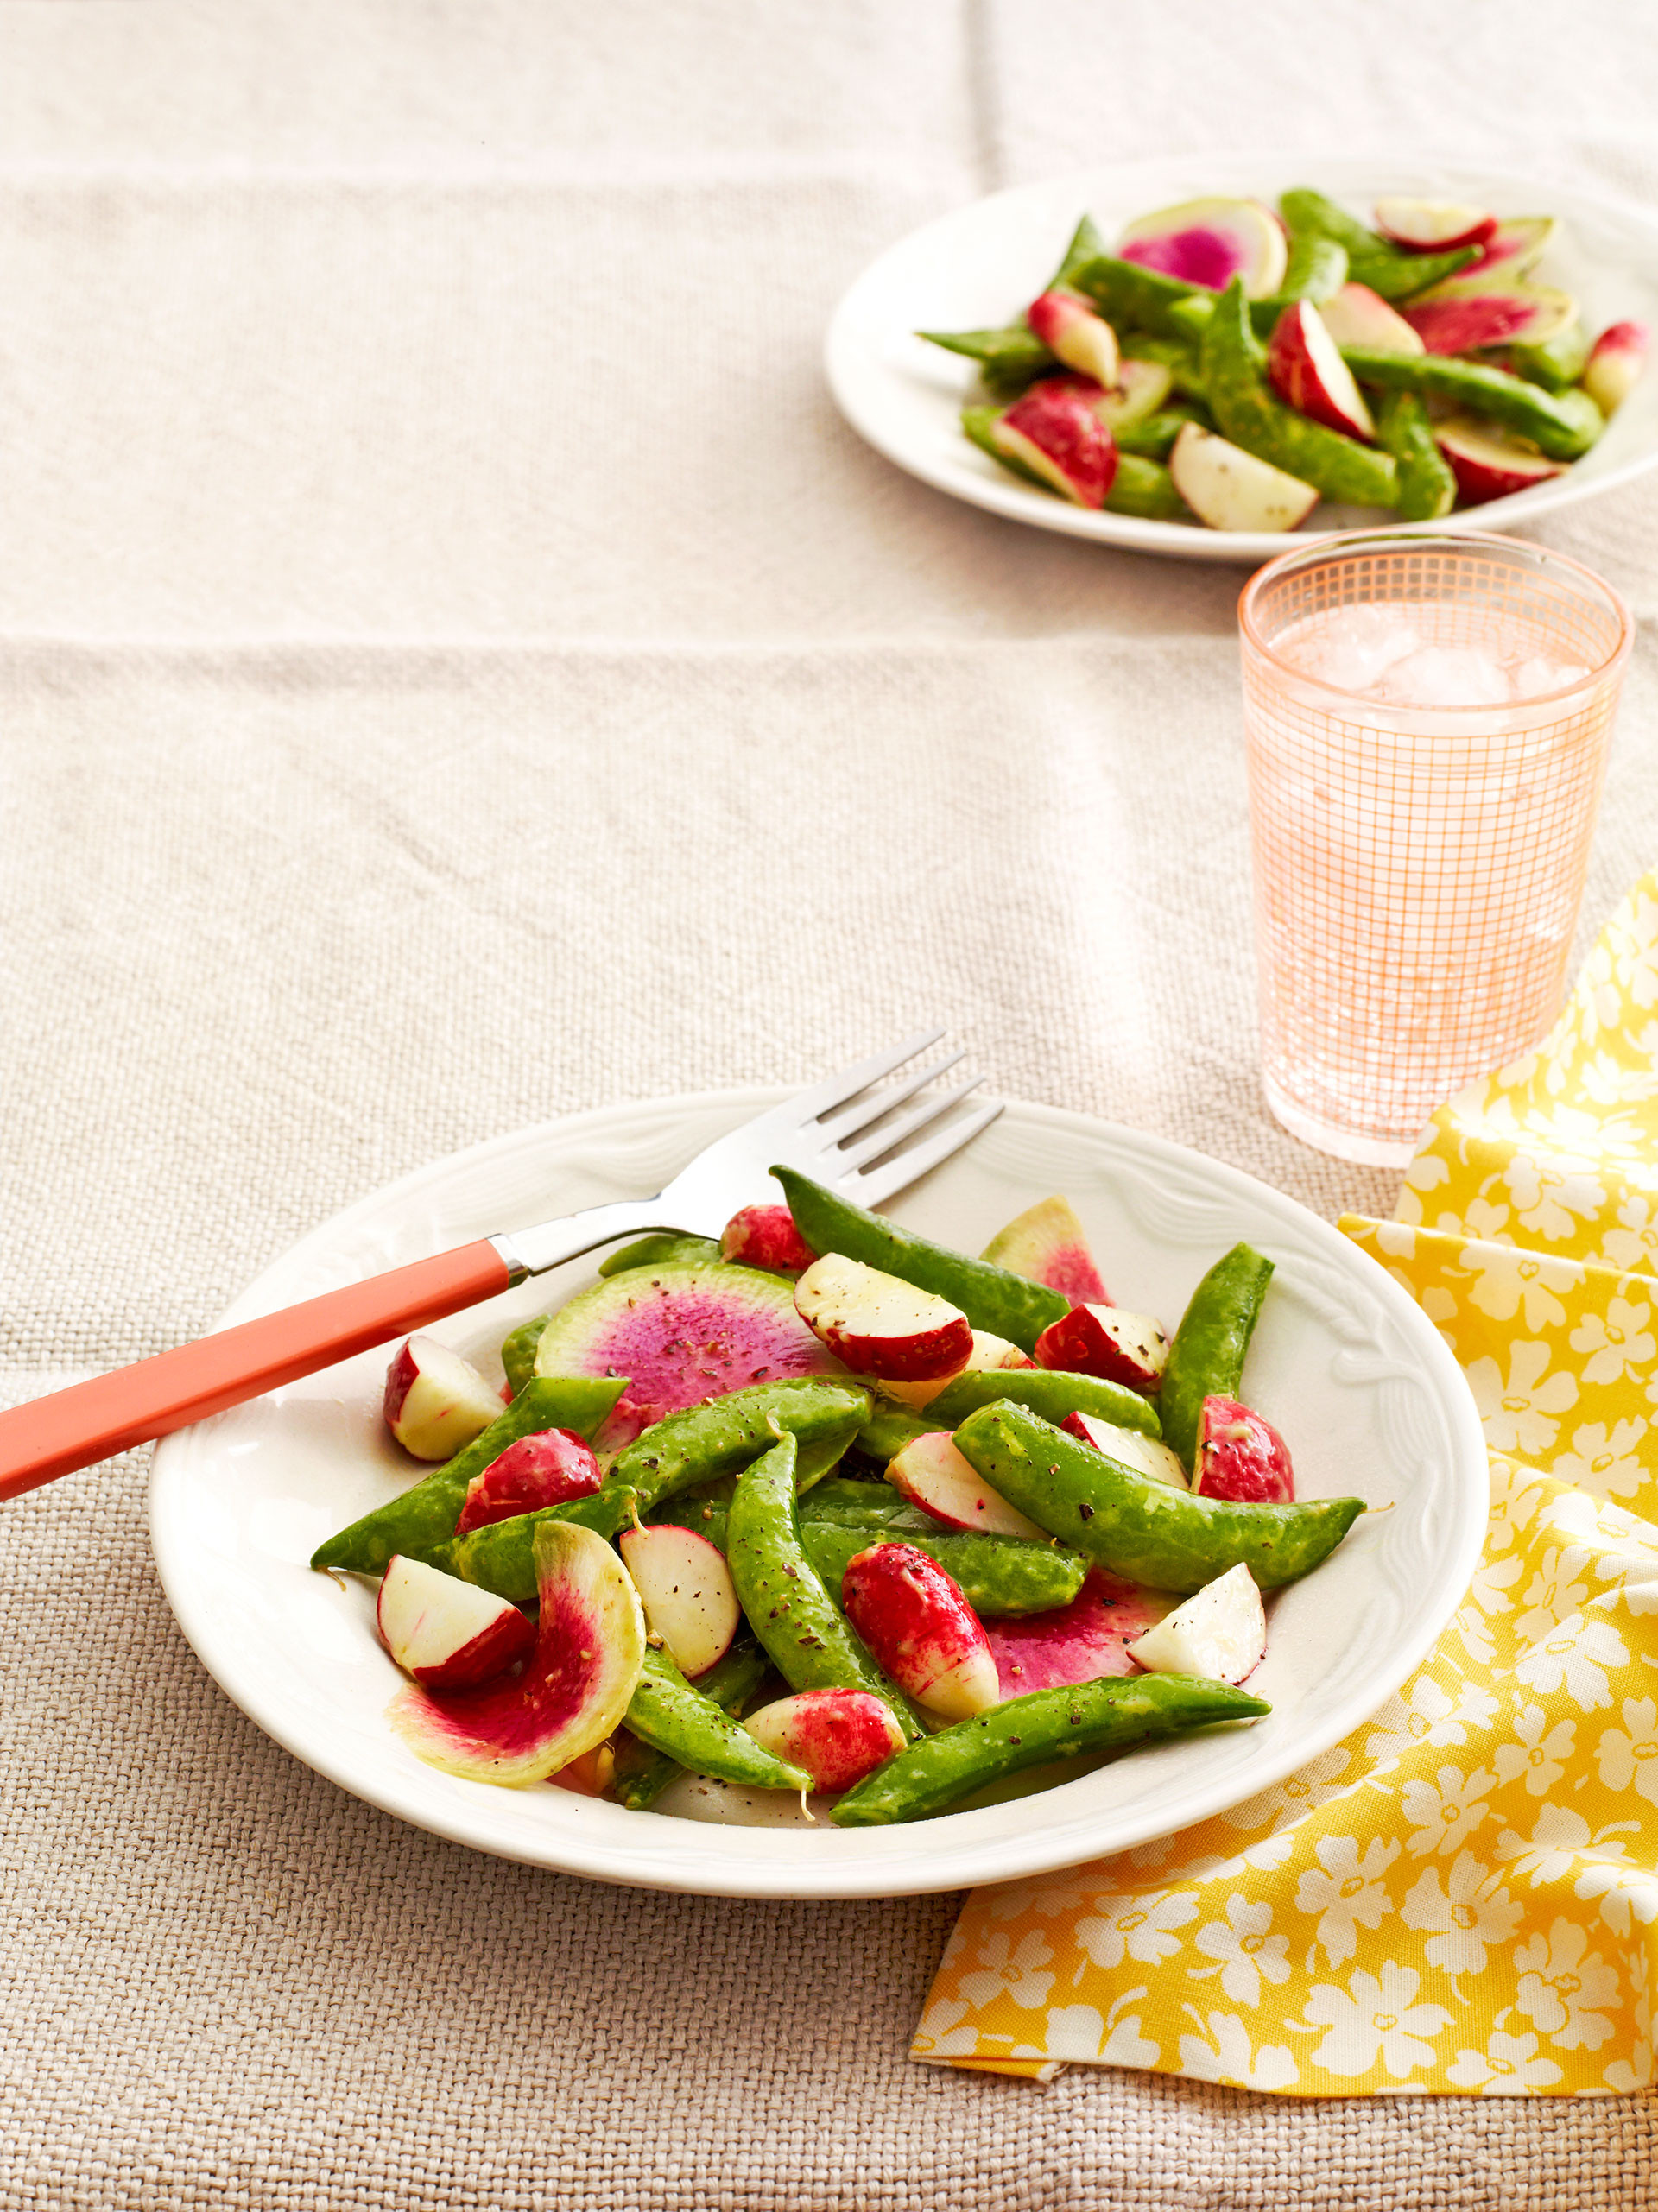 Easter Dinner Salads  57 Easter Dinner Recipes & Food Ideas Easter Menu